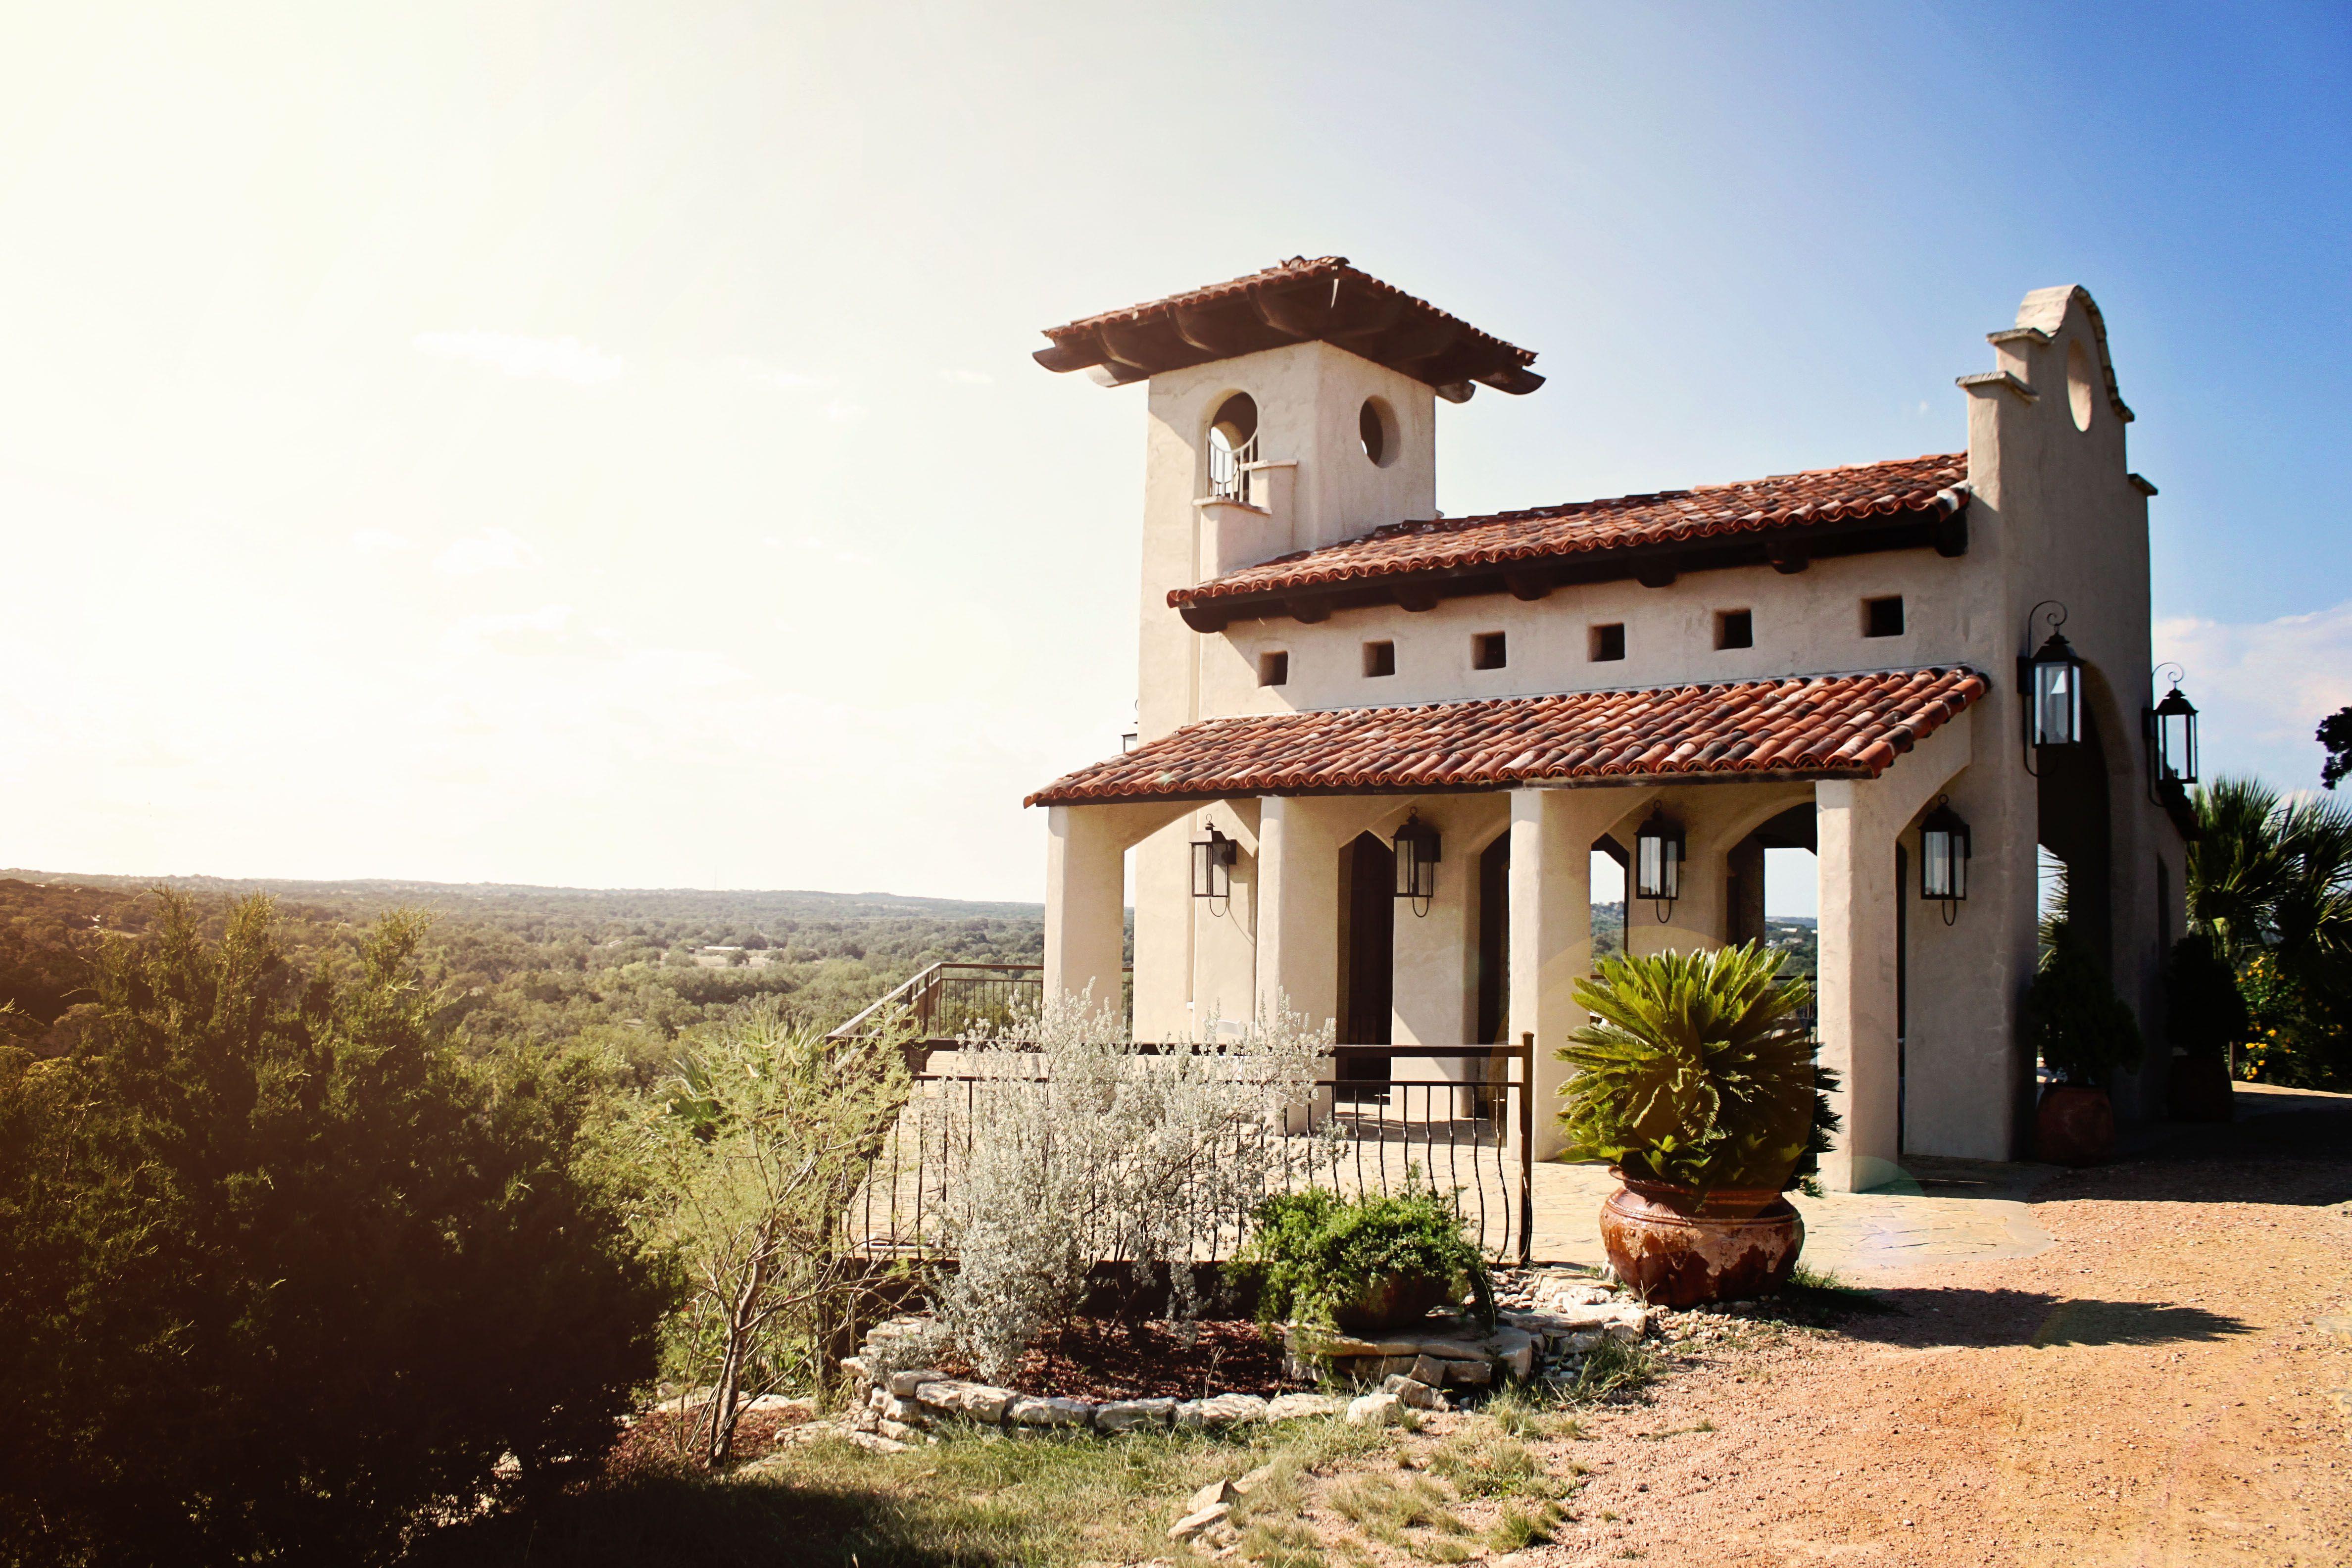 Chapel Dulcinea, Austin Texas. I want to go take